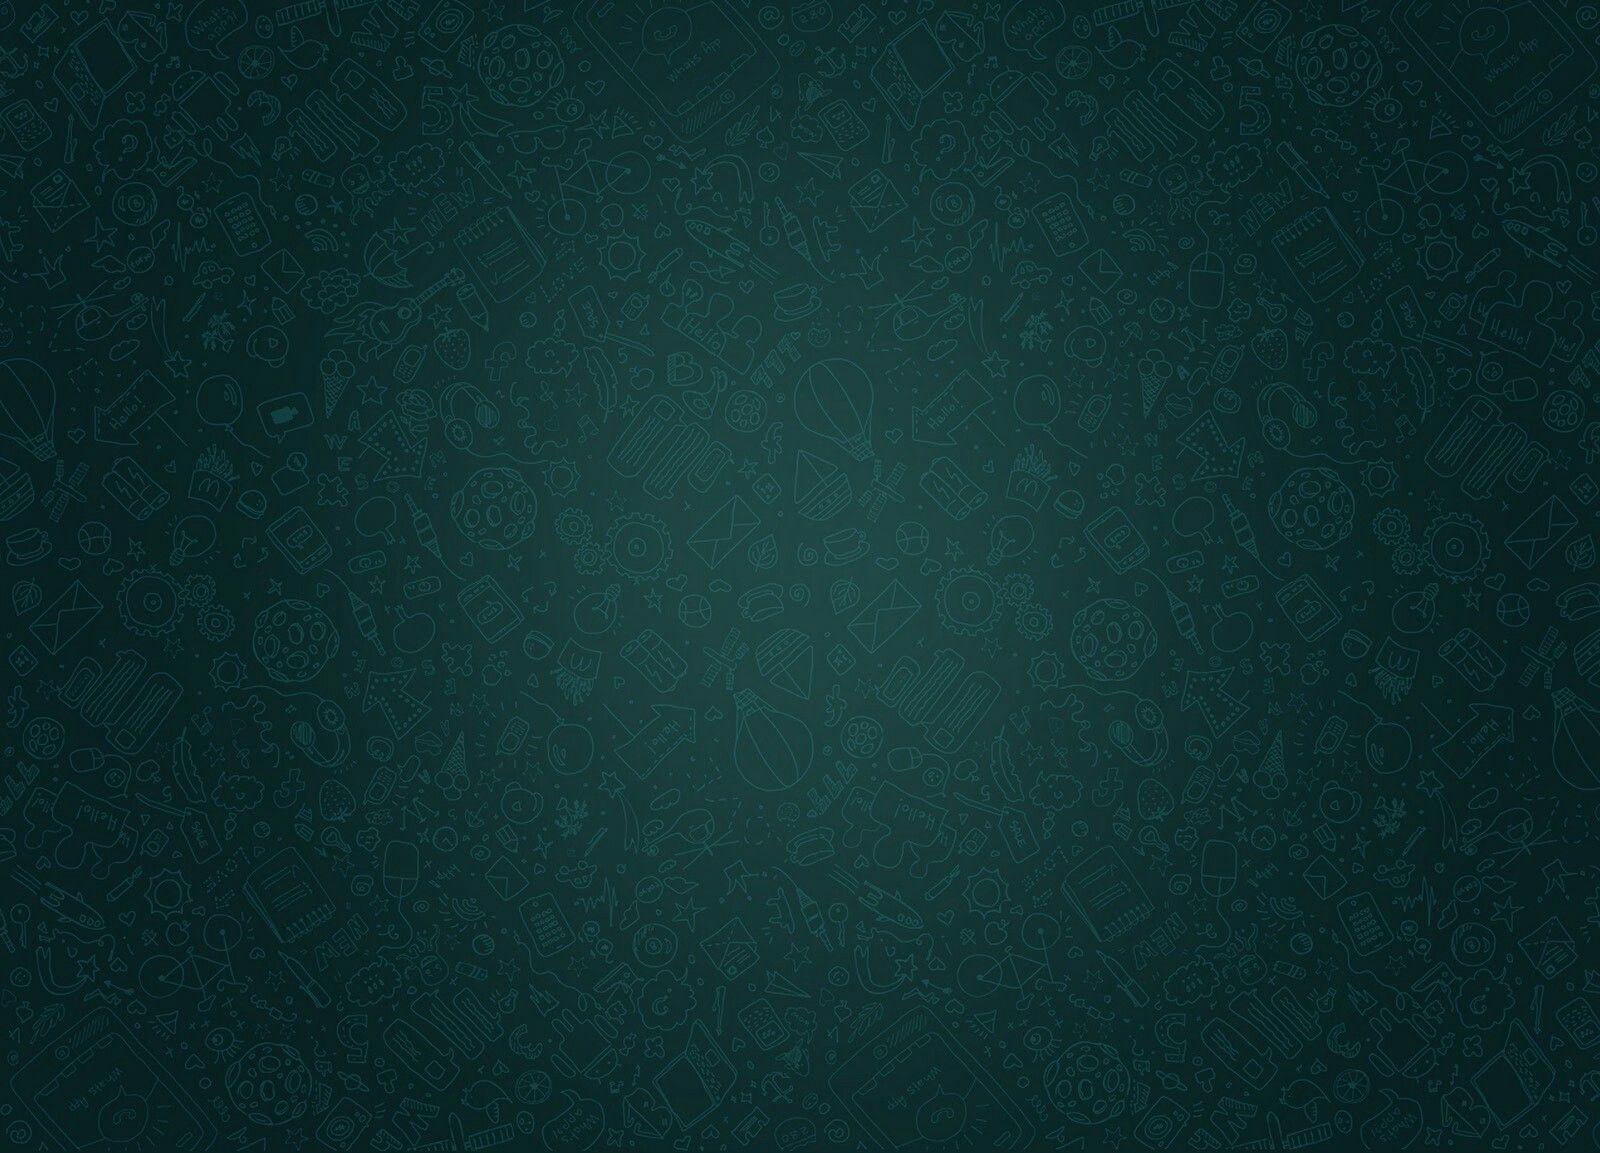 Most Inspiring Wallpaper Marble Whatsapp - 628a064e53d4d2afa7ef36075e98f1b1  You Should Have_84851.jpg